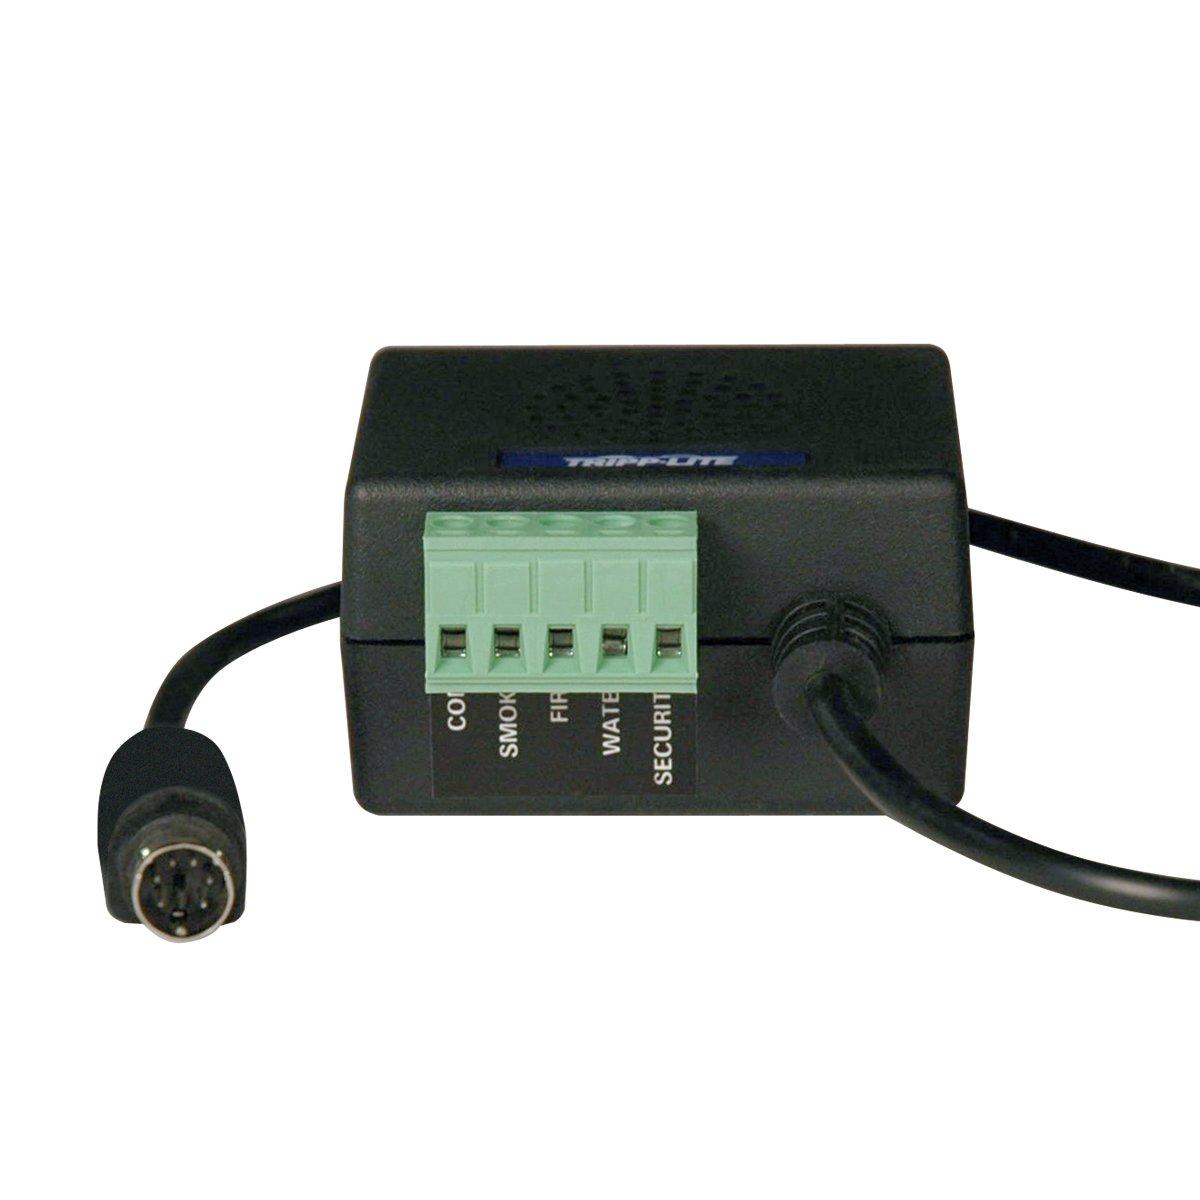 Tripp Lite ENVIROSENSE Environmental Sensor for use with SNMP/Web Cards